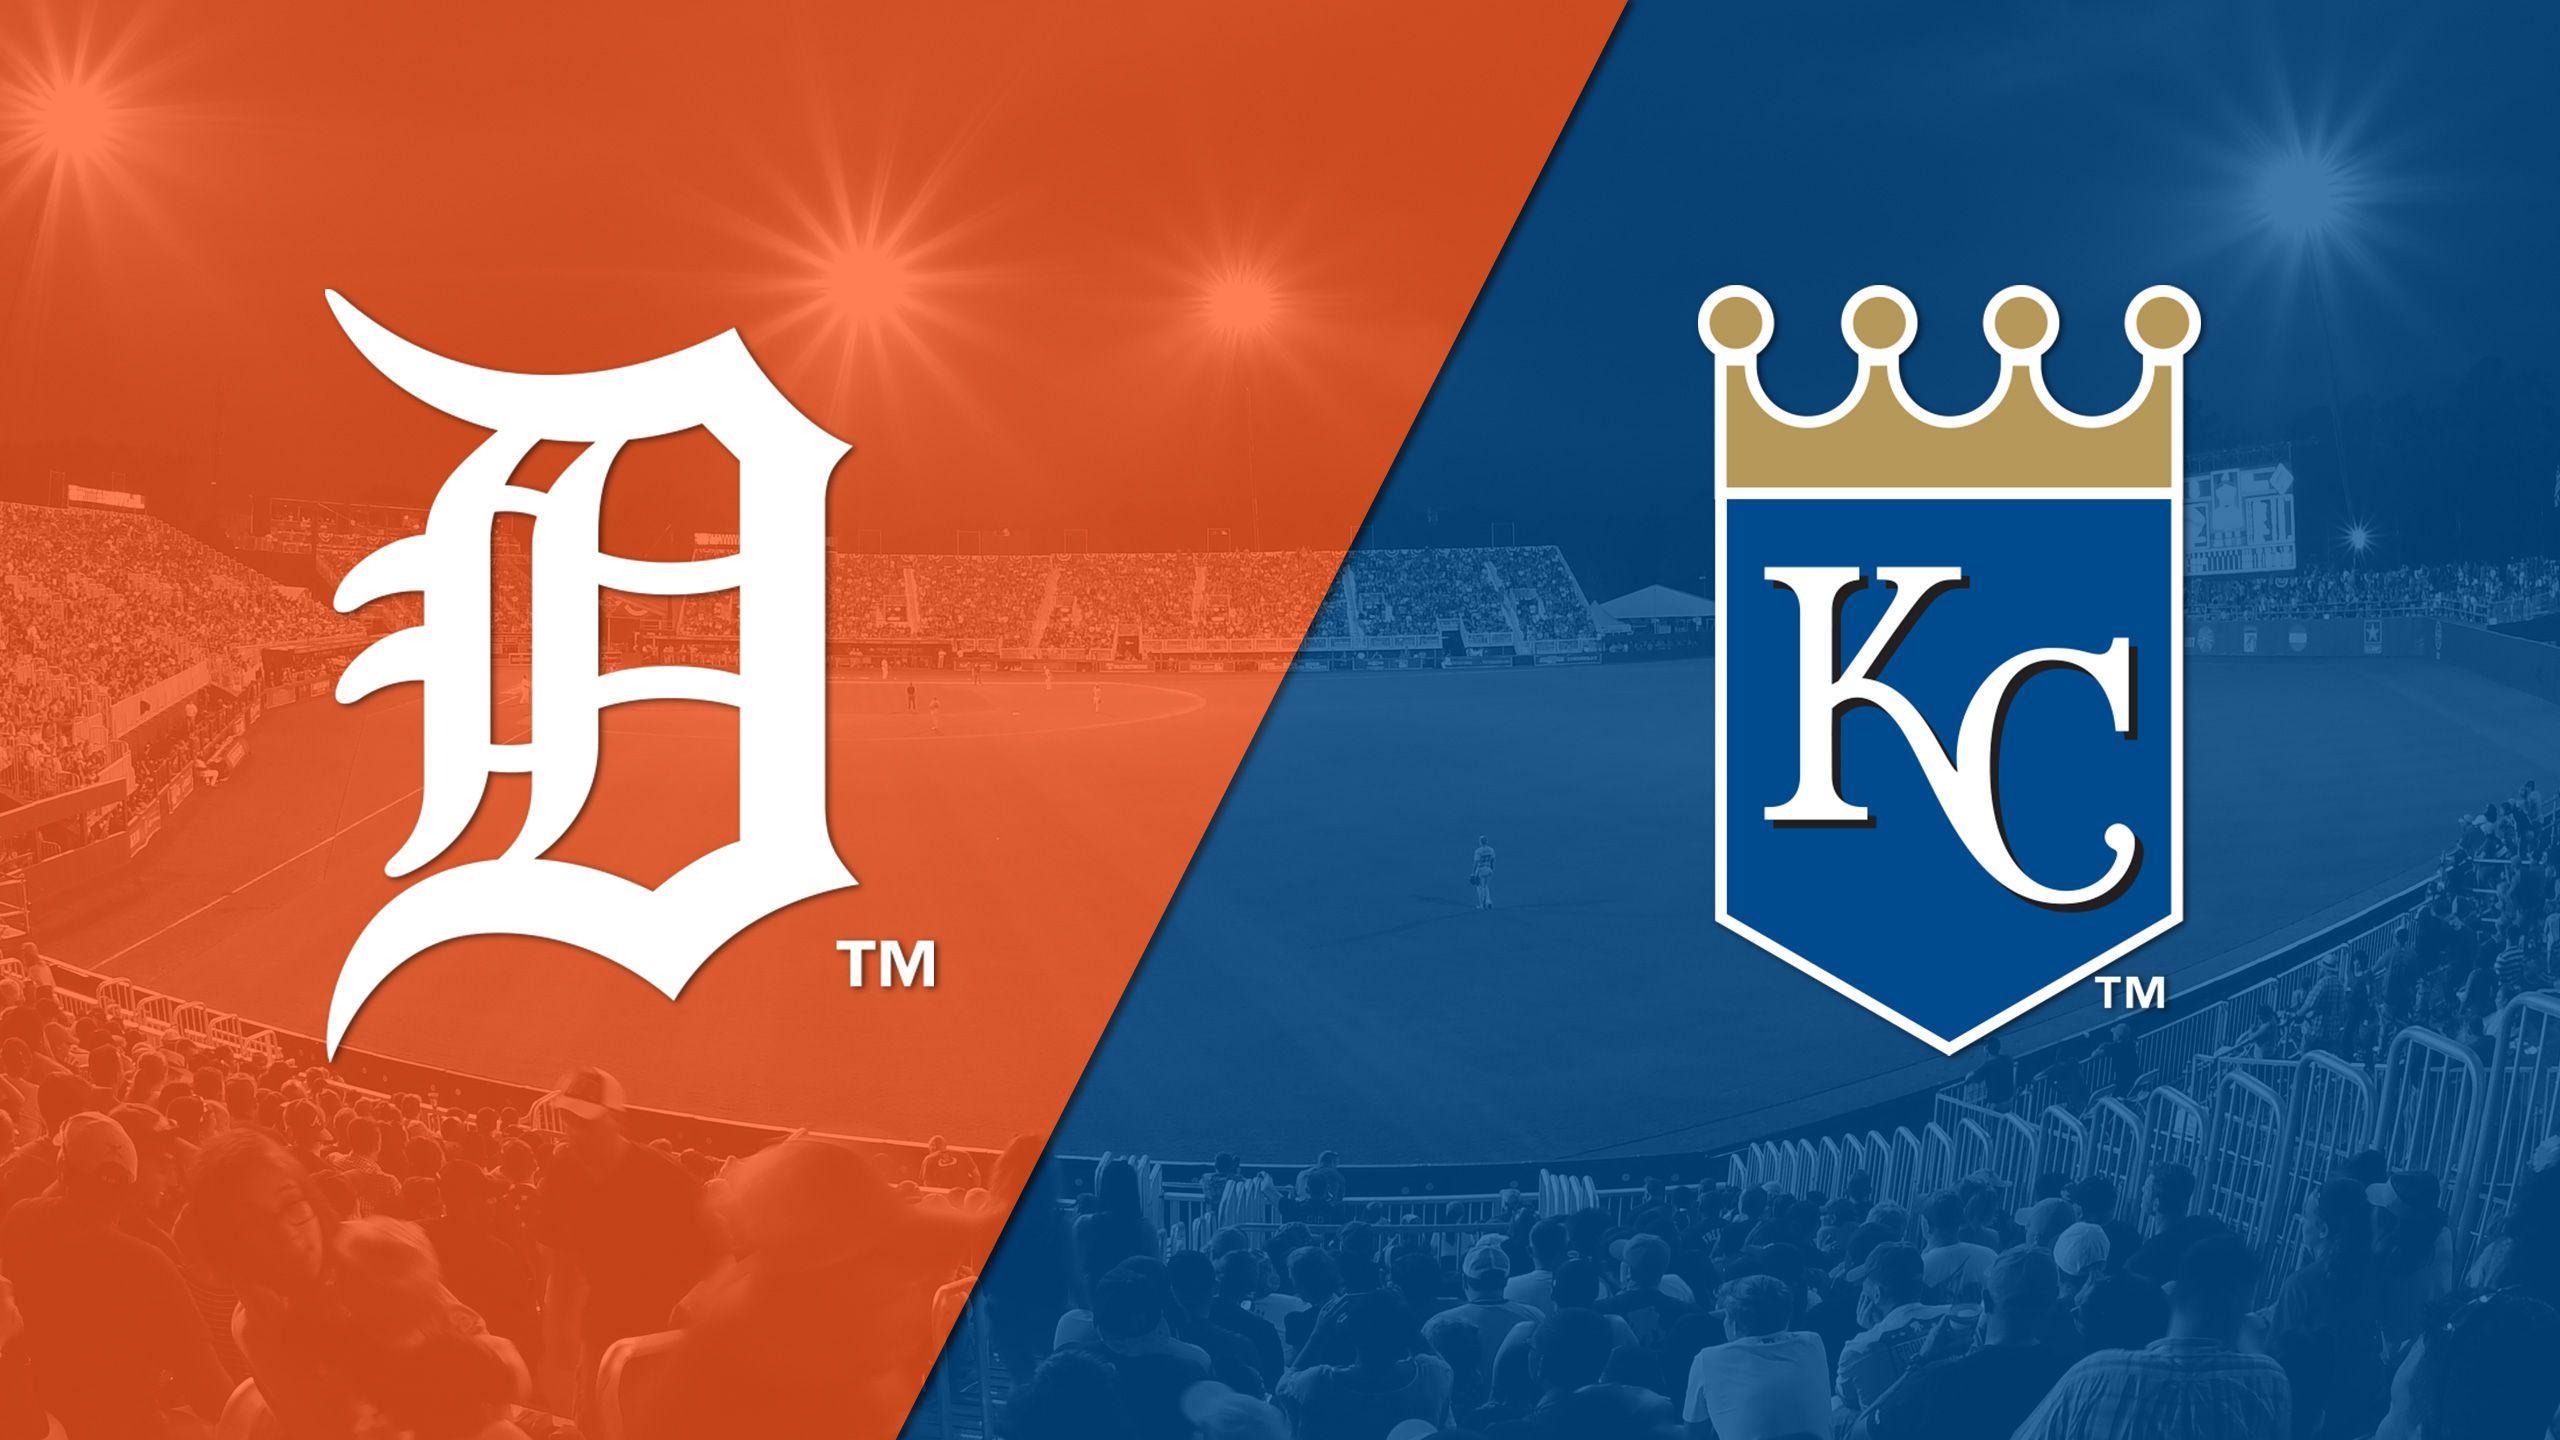 Detroit Tigers vs. Kansas City Royals